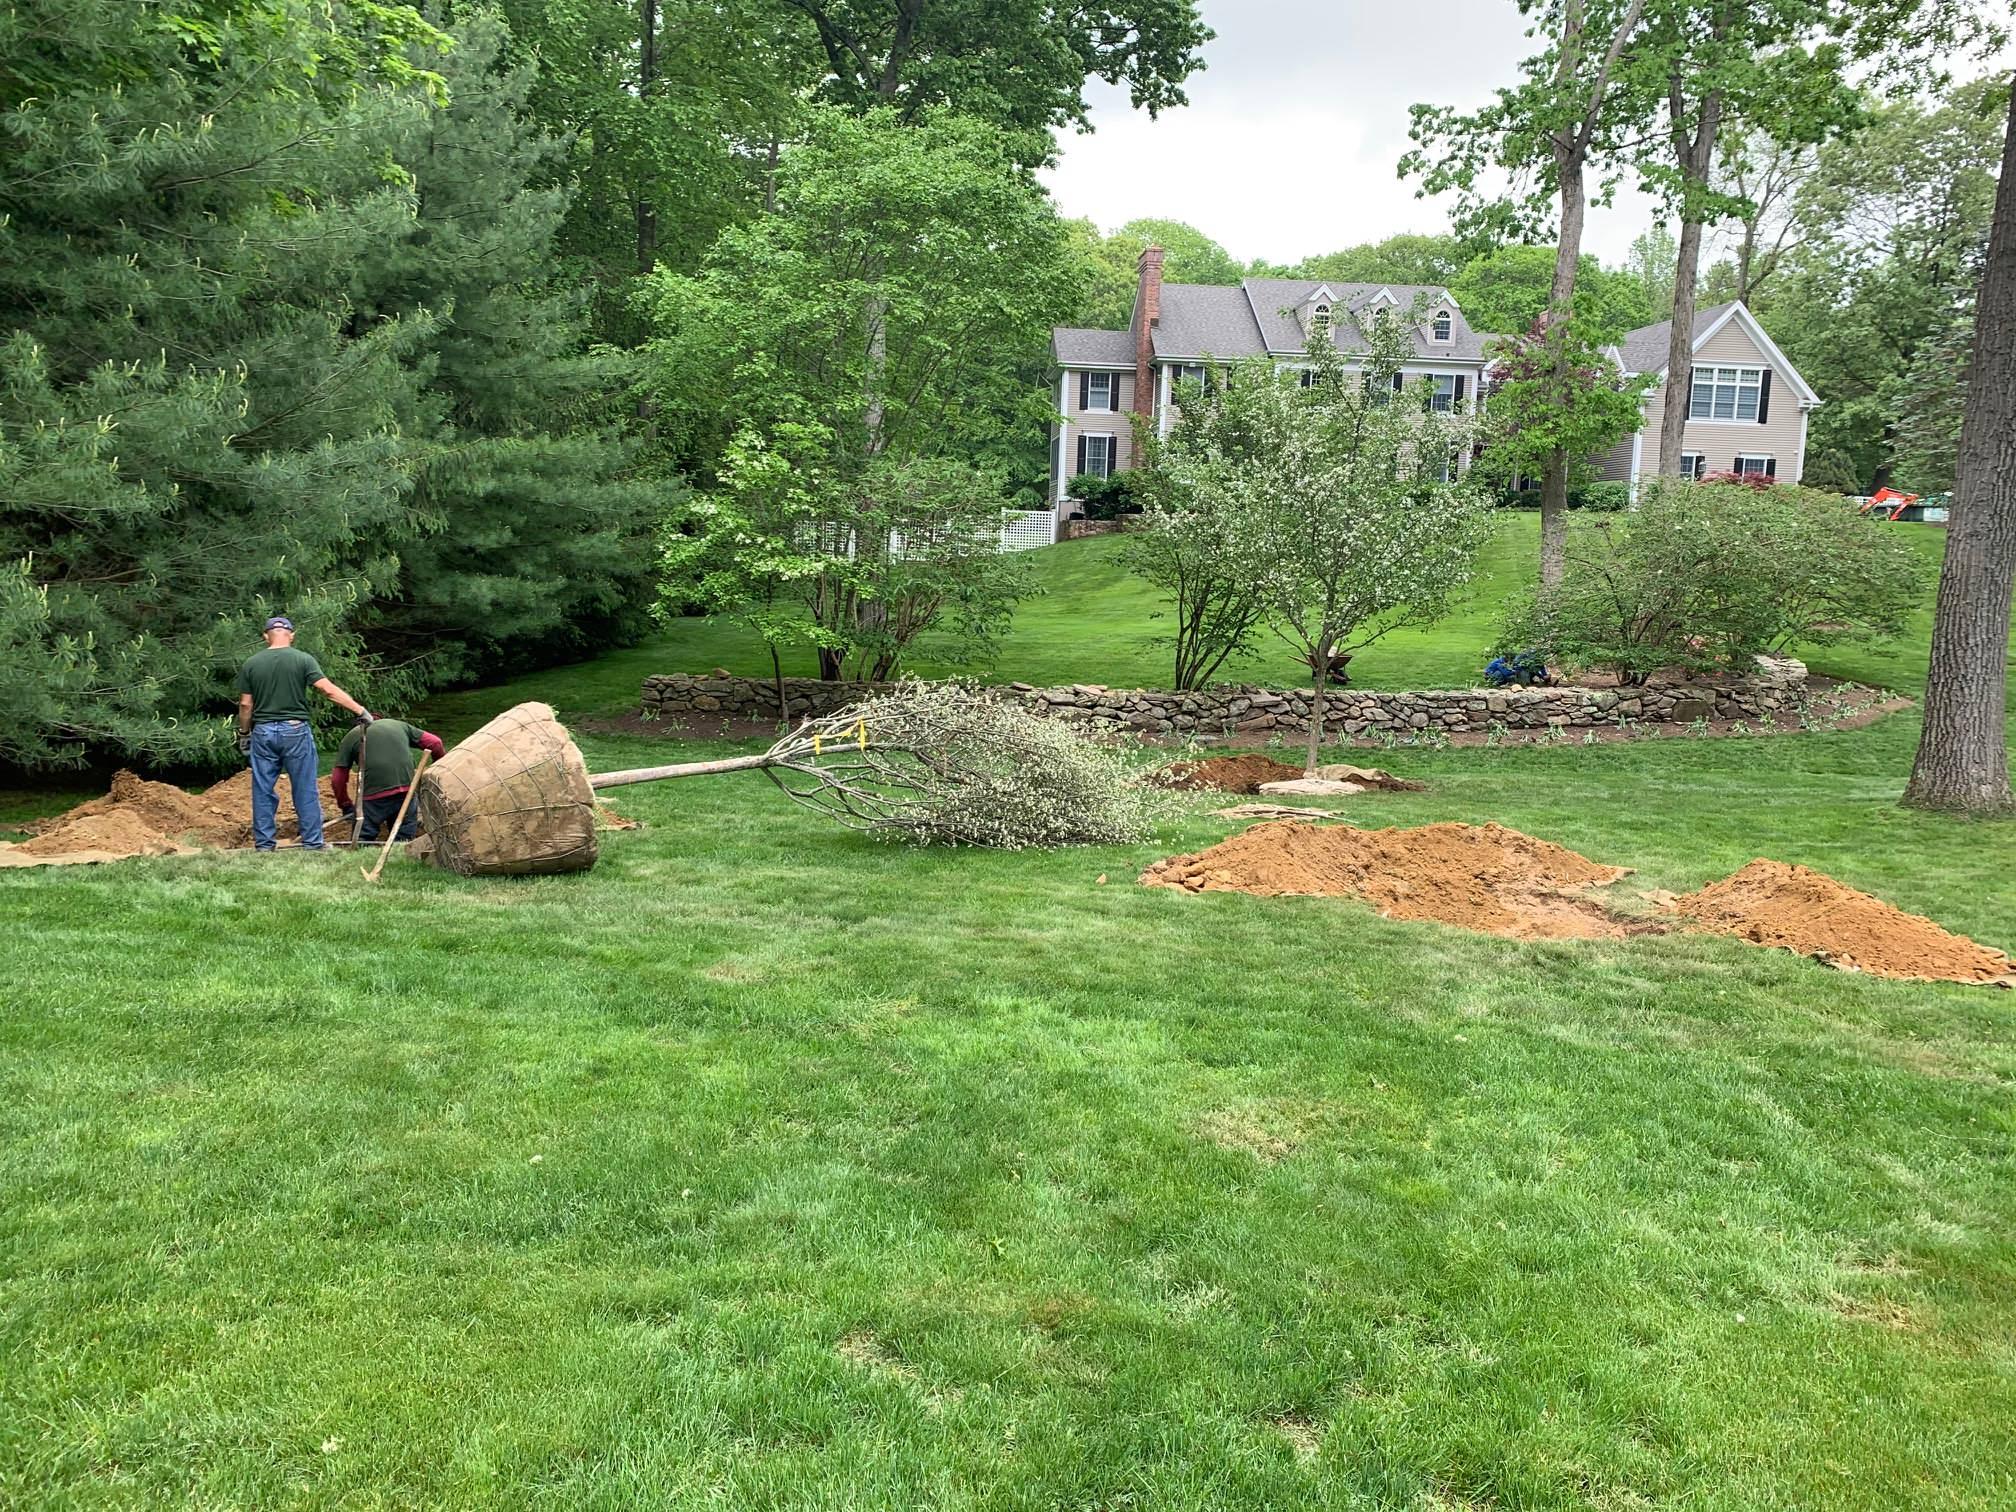 Planting Washington Hawthorn Trees to form orchard